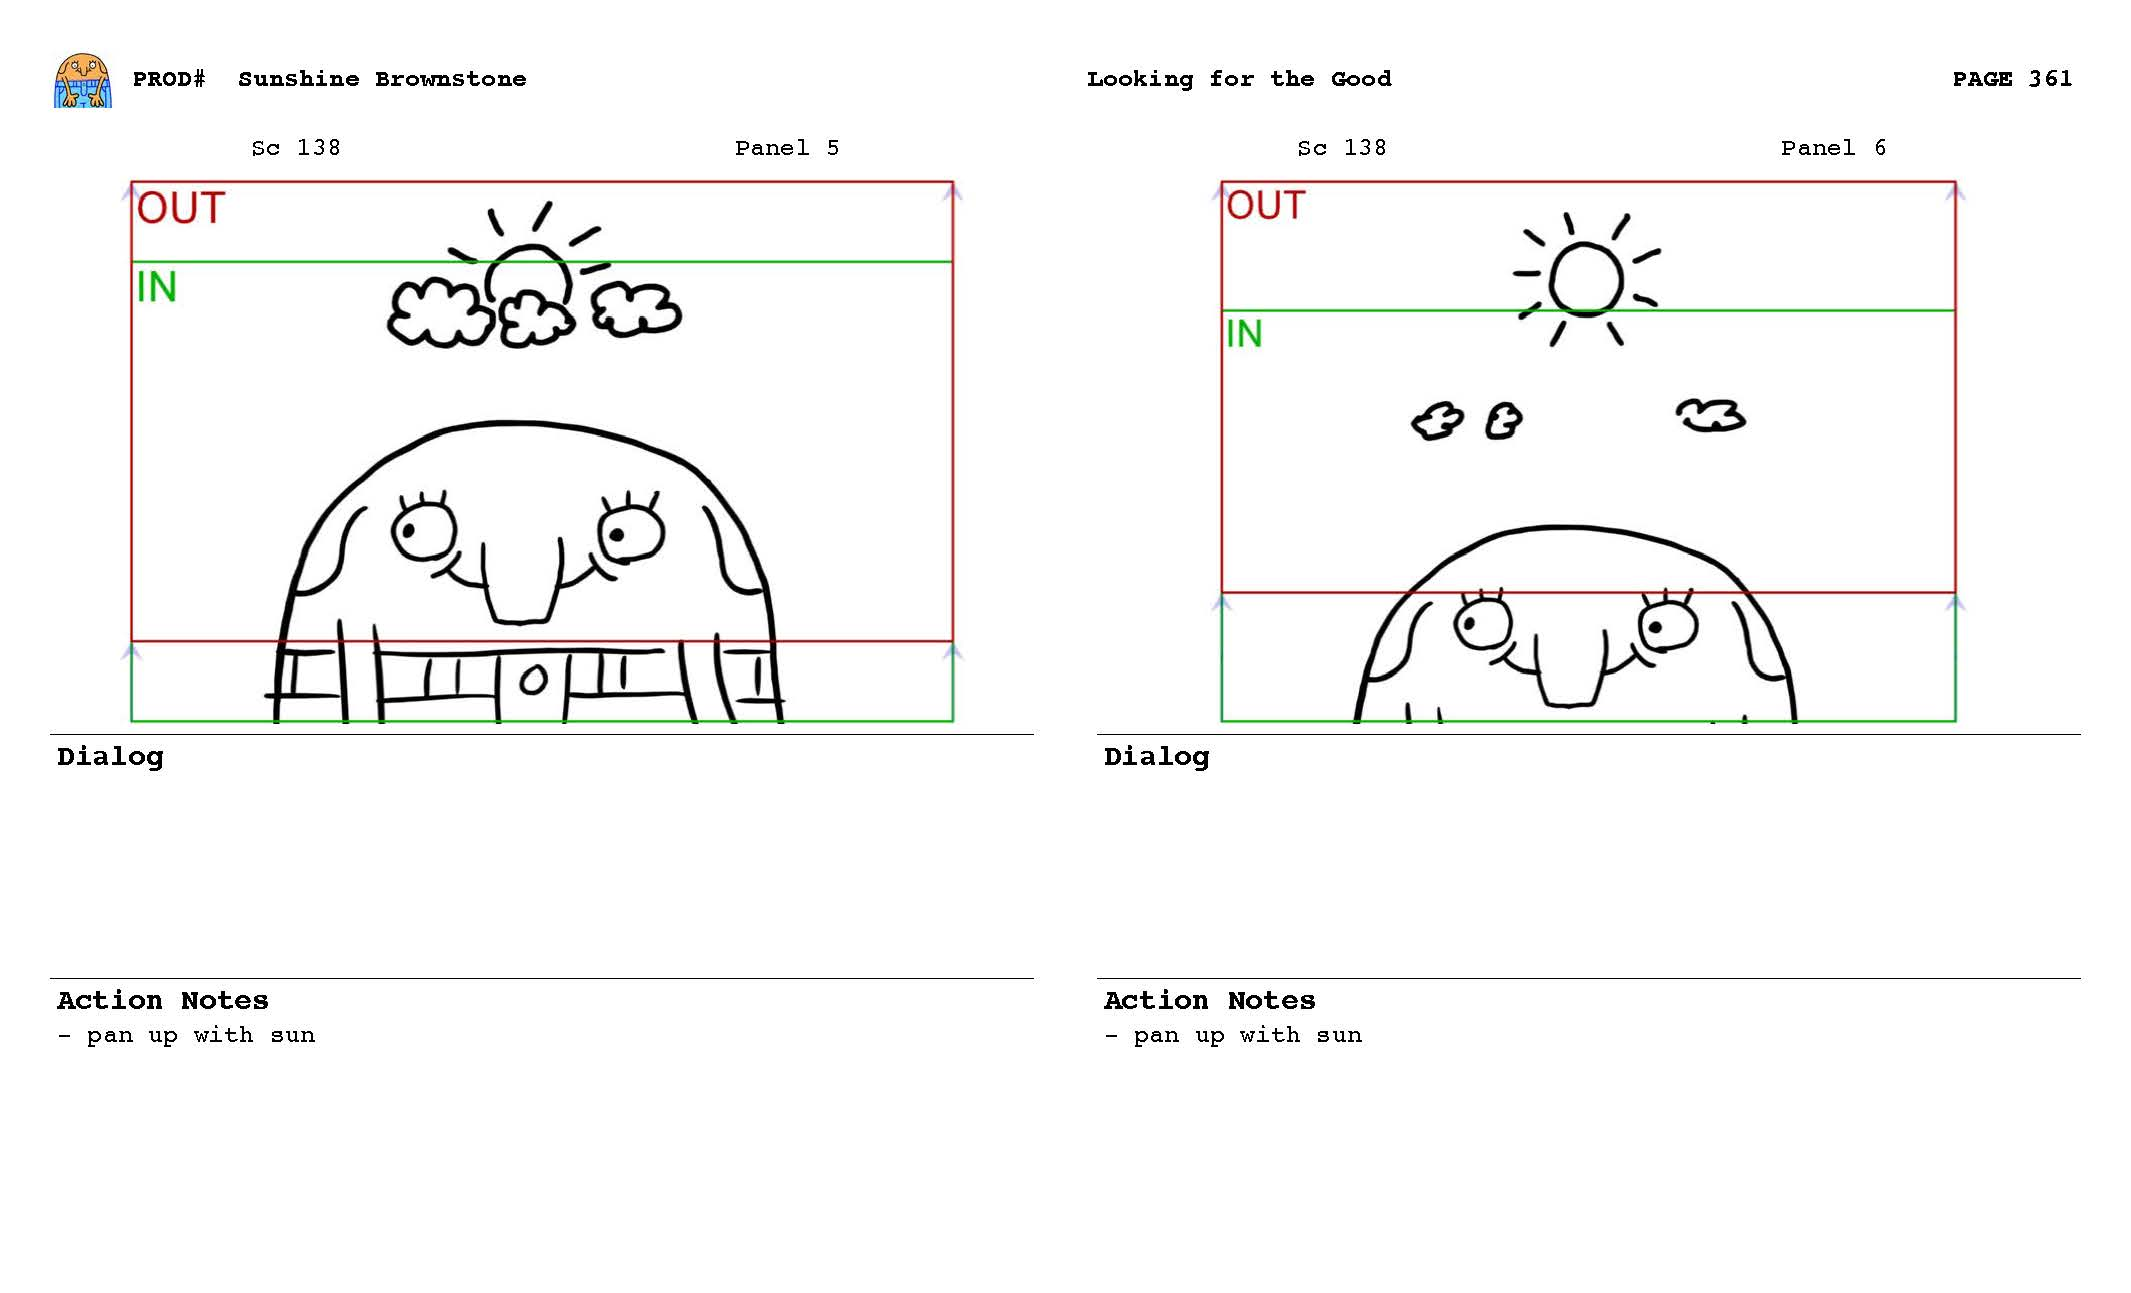 SunshineBrownstone_Dev1_Page_361.jpg